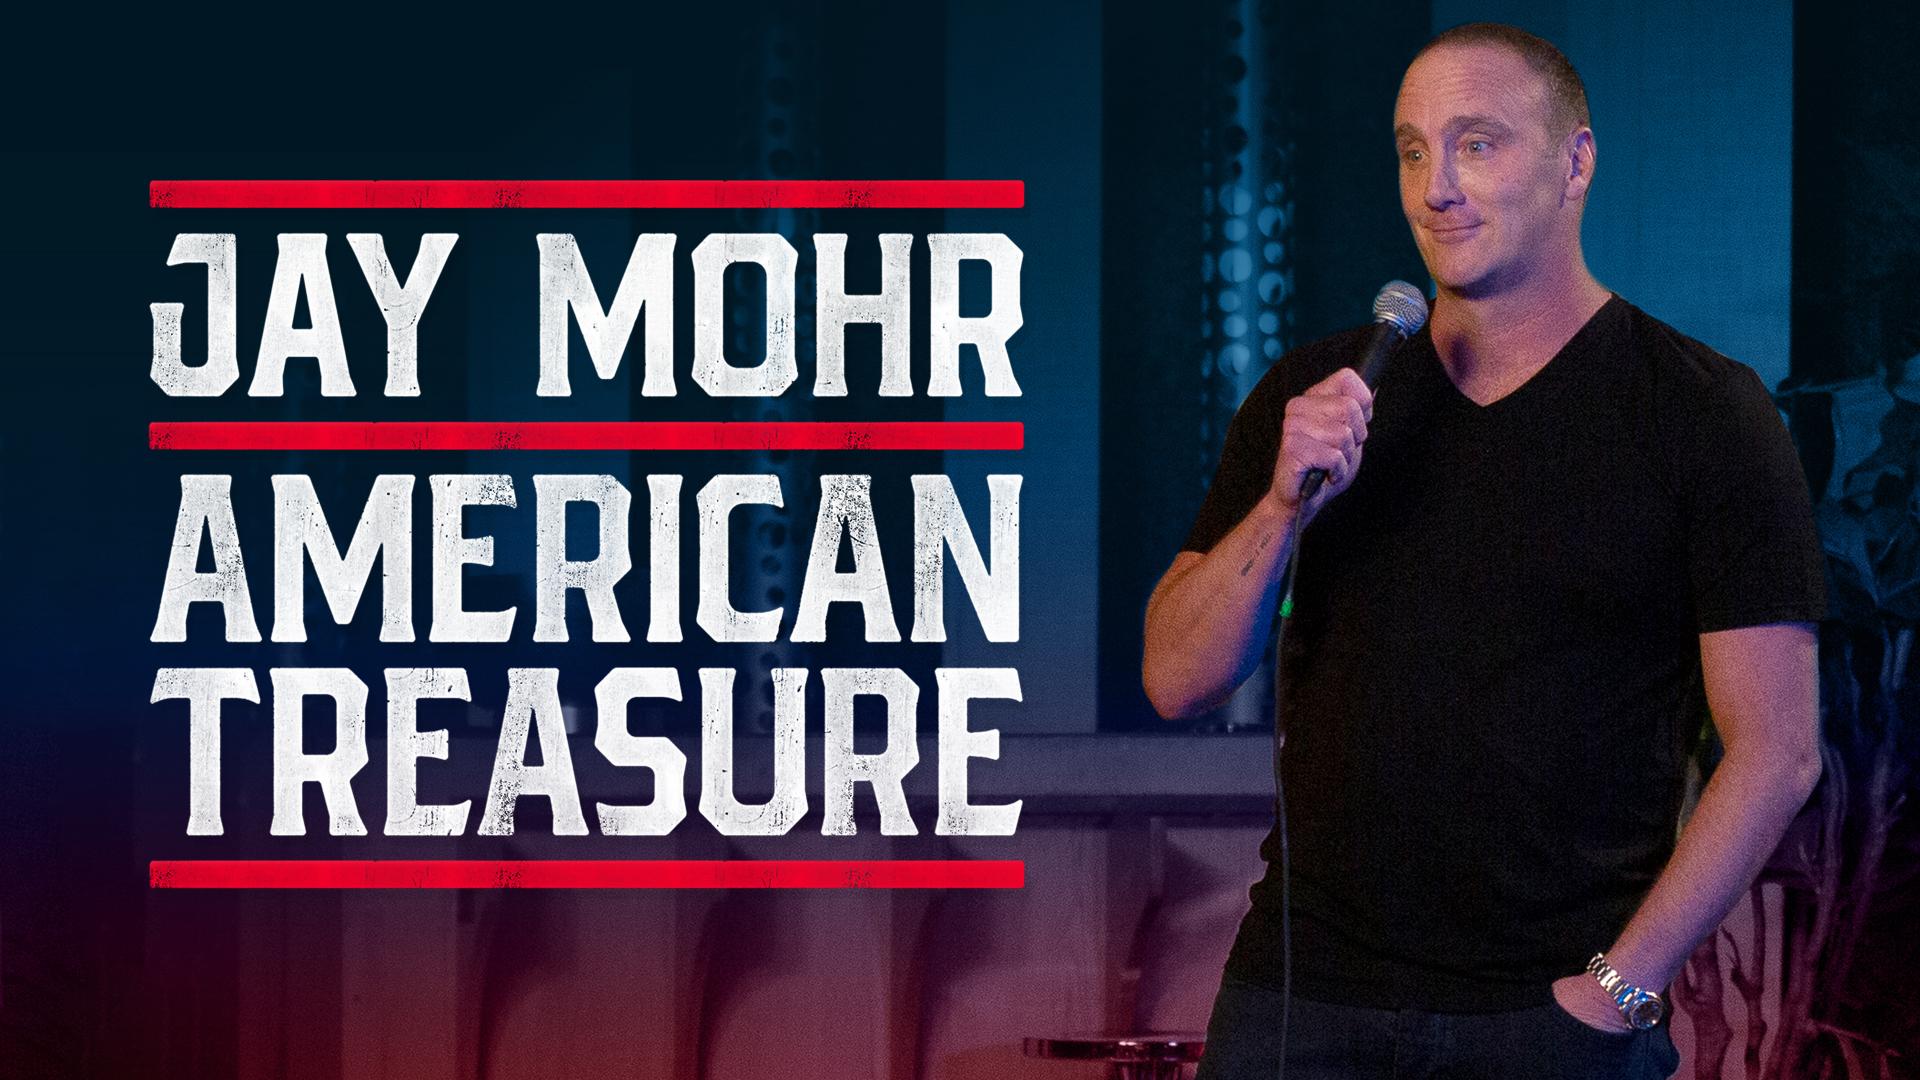 Jay Mohr: American Treasure